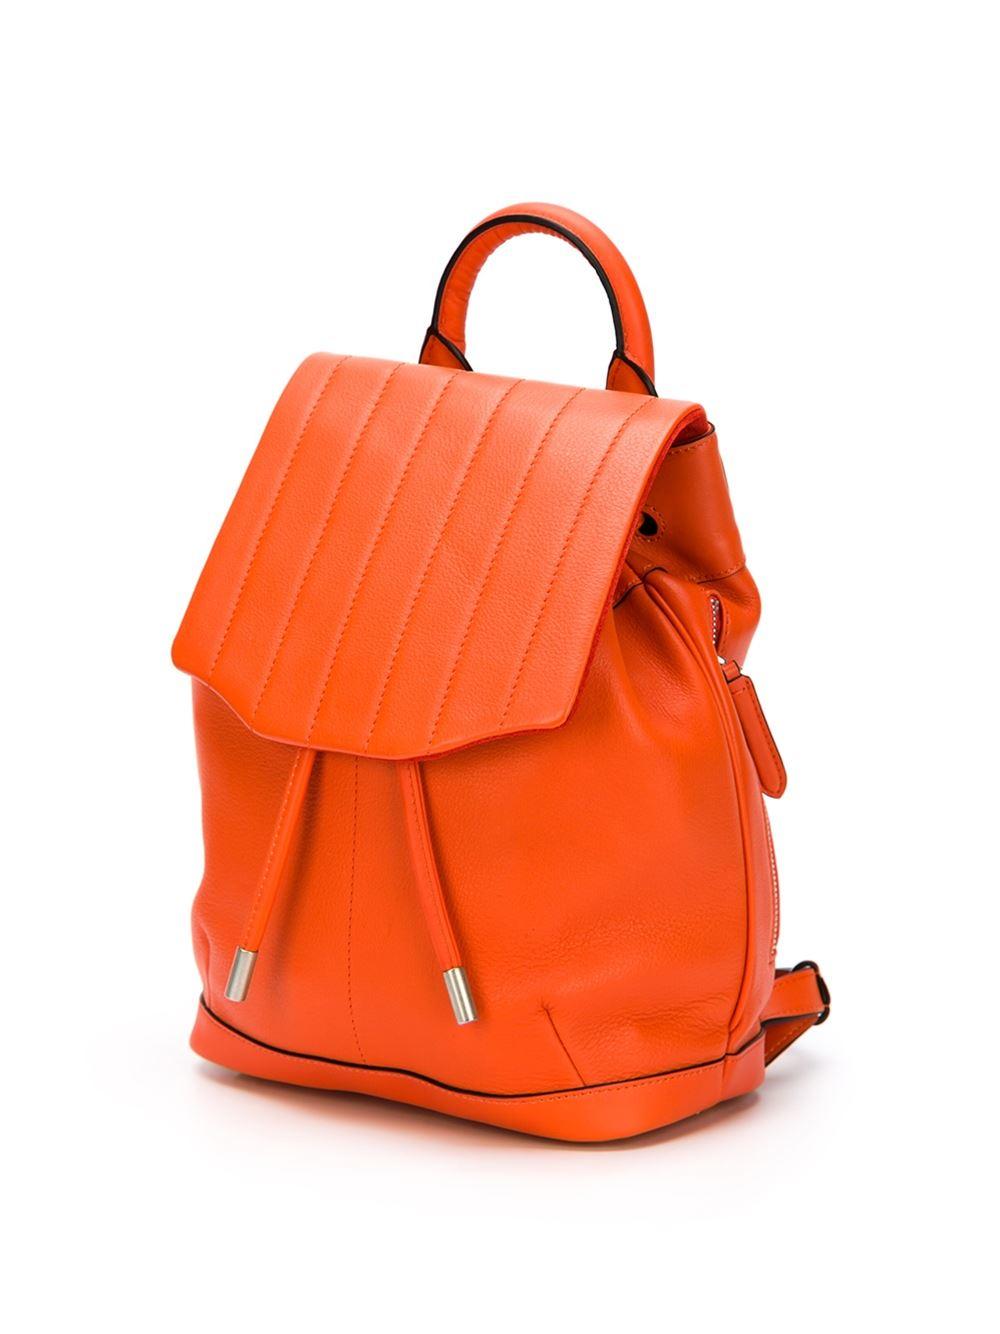 Rag & Bone Mini 'pilot' Backpack in Yellow & Orange (Orange)